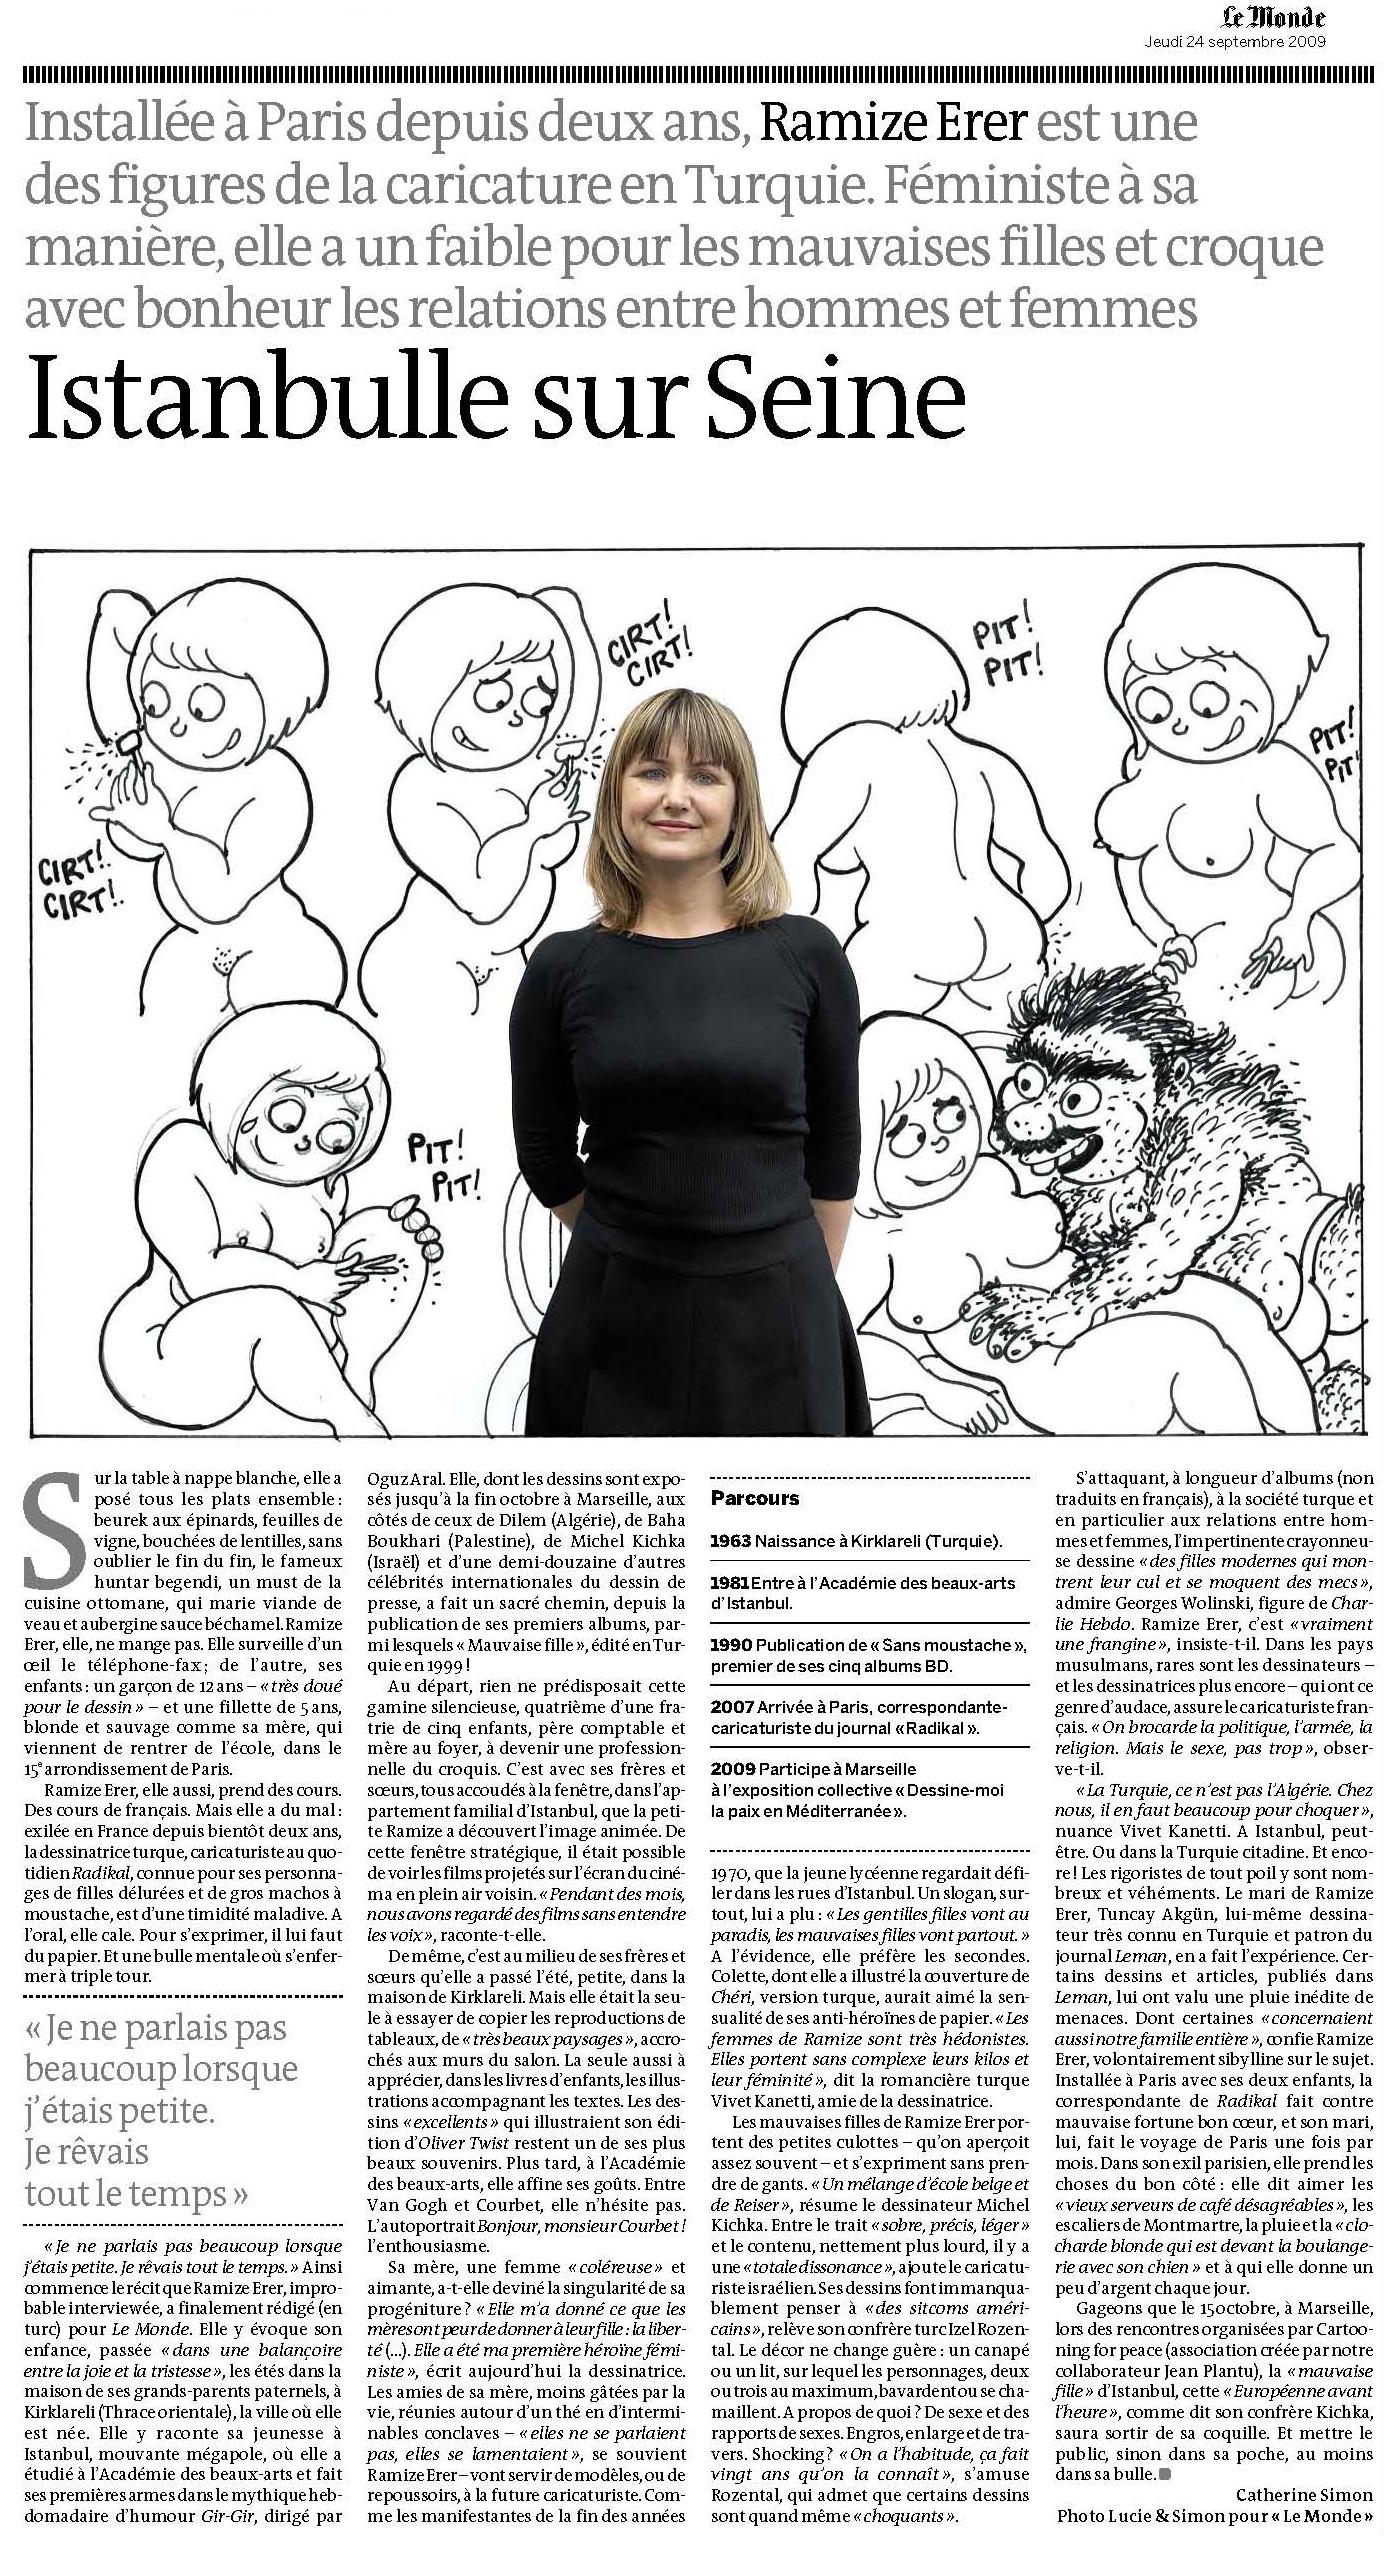 RAMIZE-ERRER-cartoonist-2